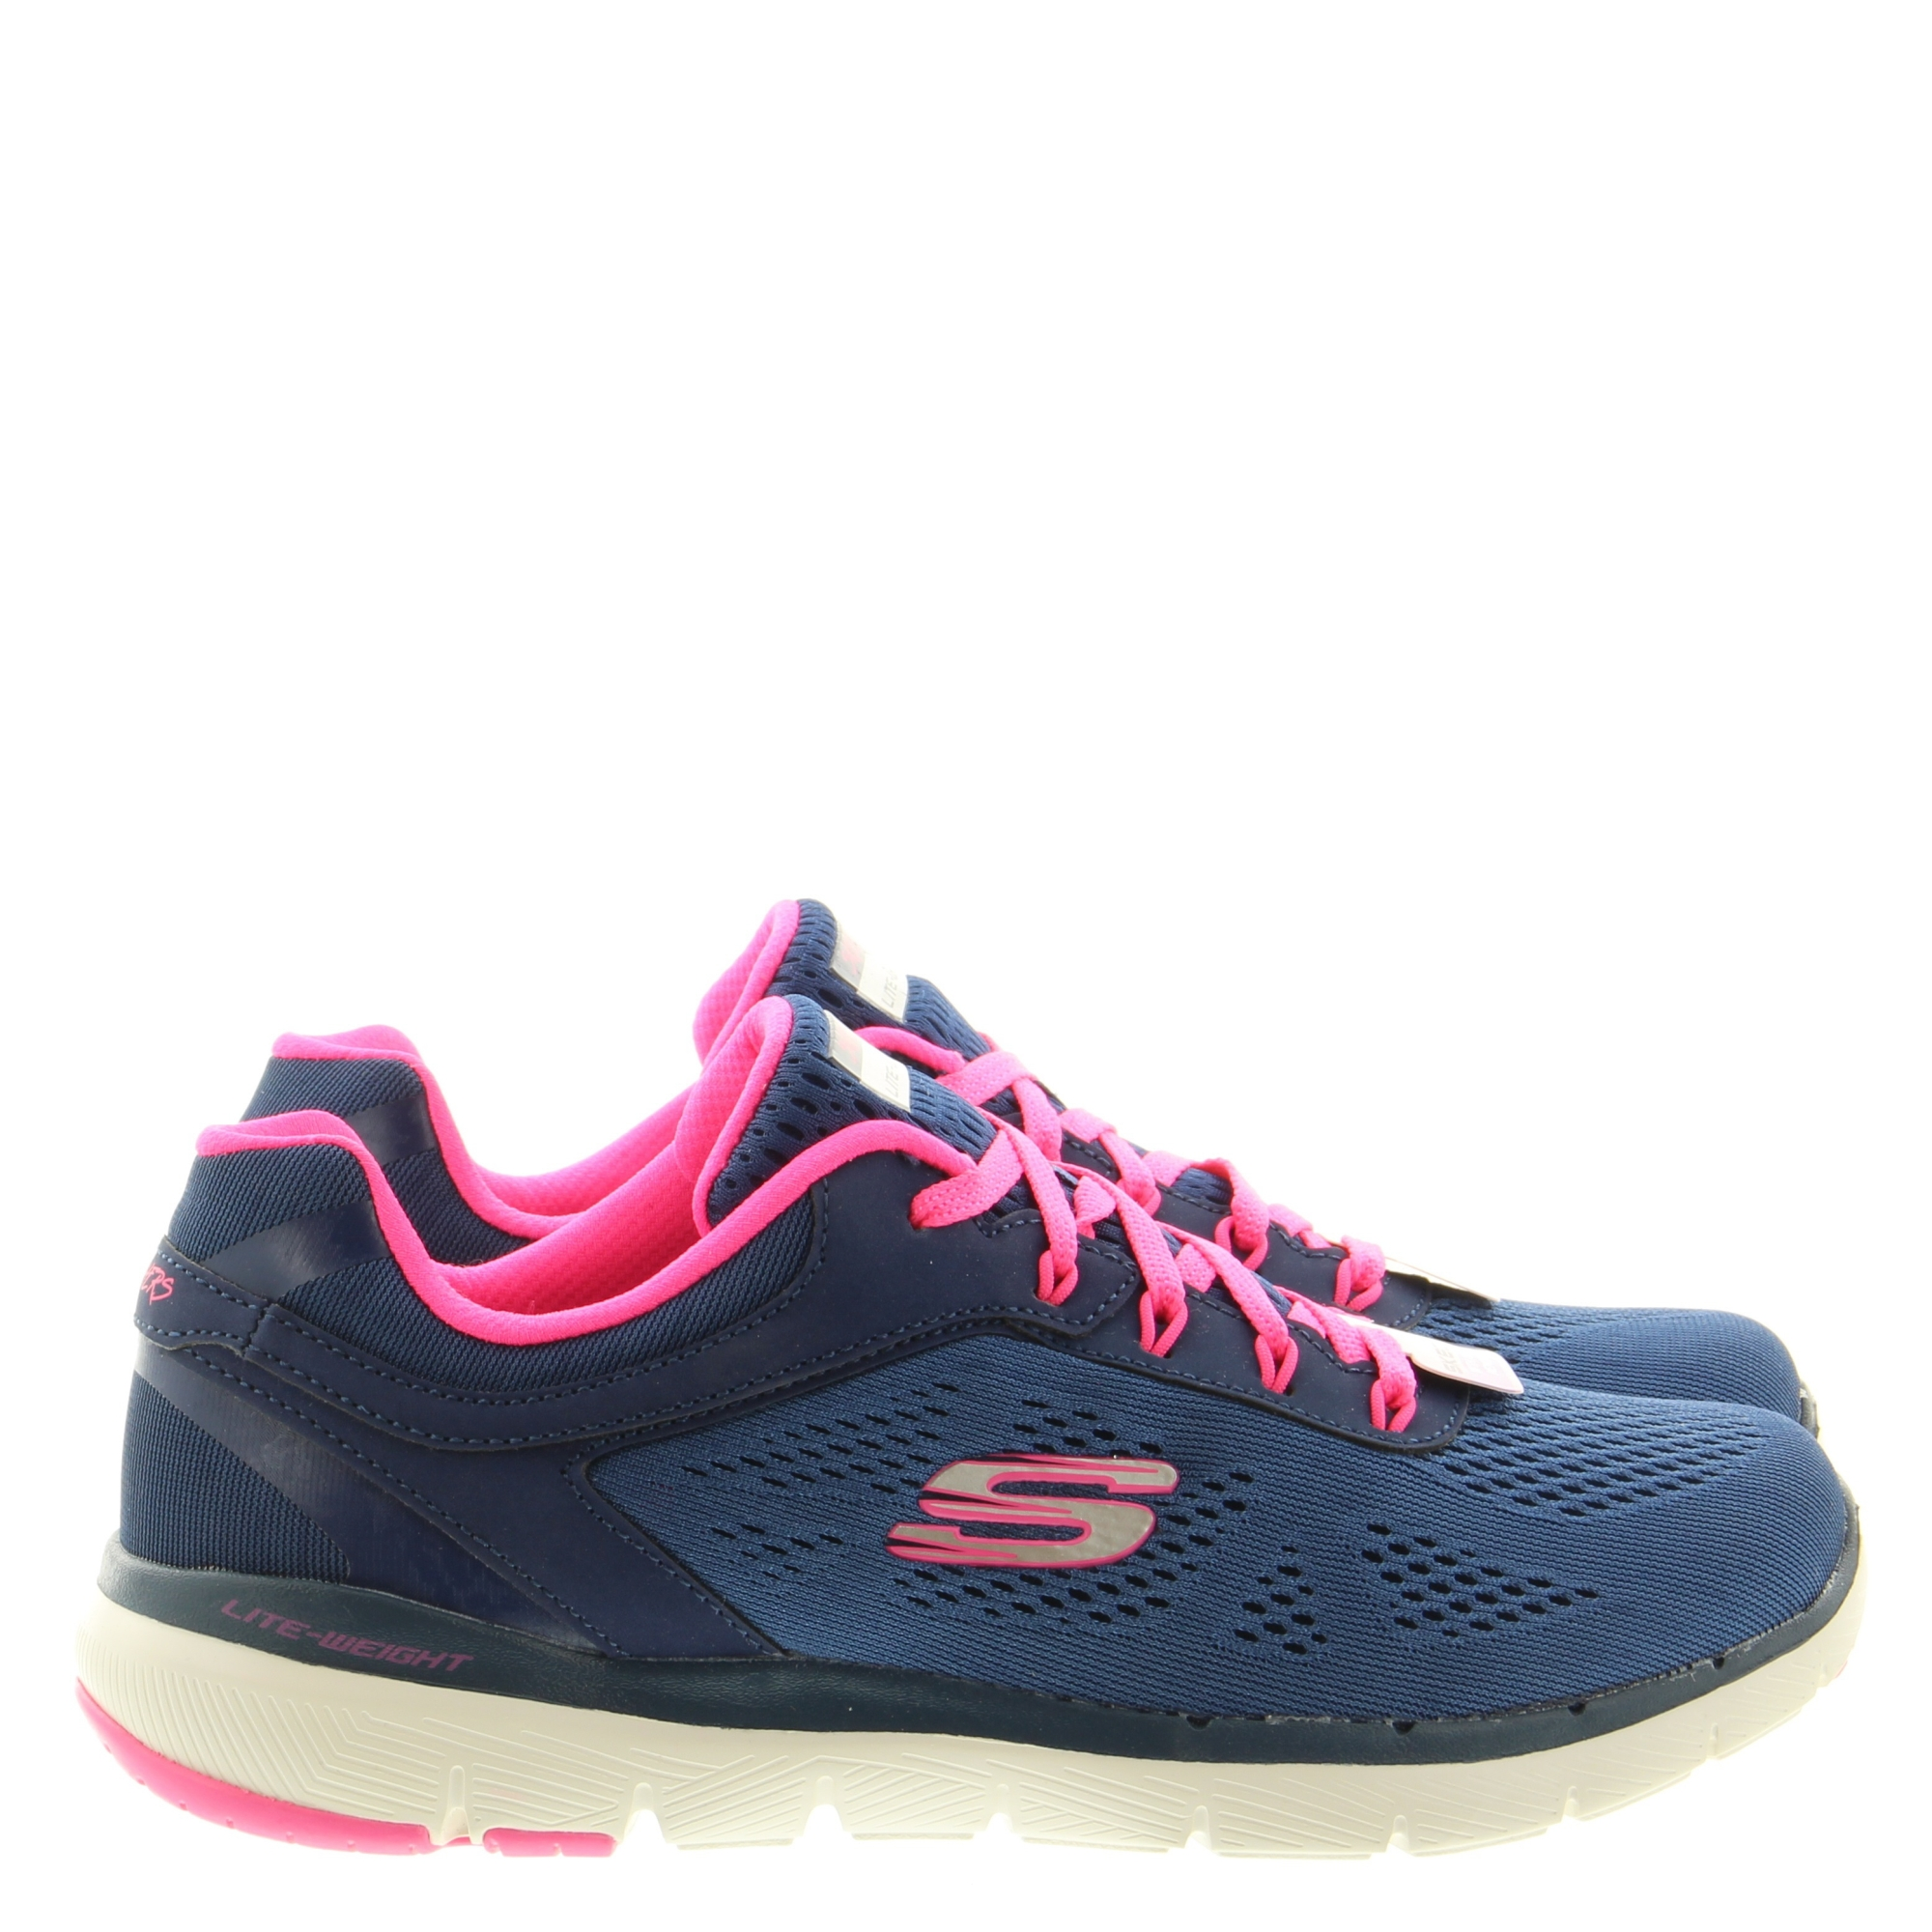 Skechers 13059 NVHP Navy Hot Pink